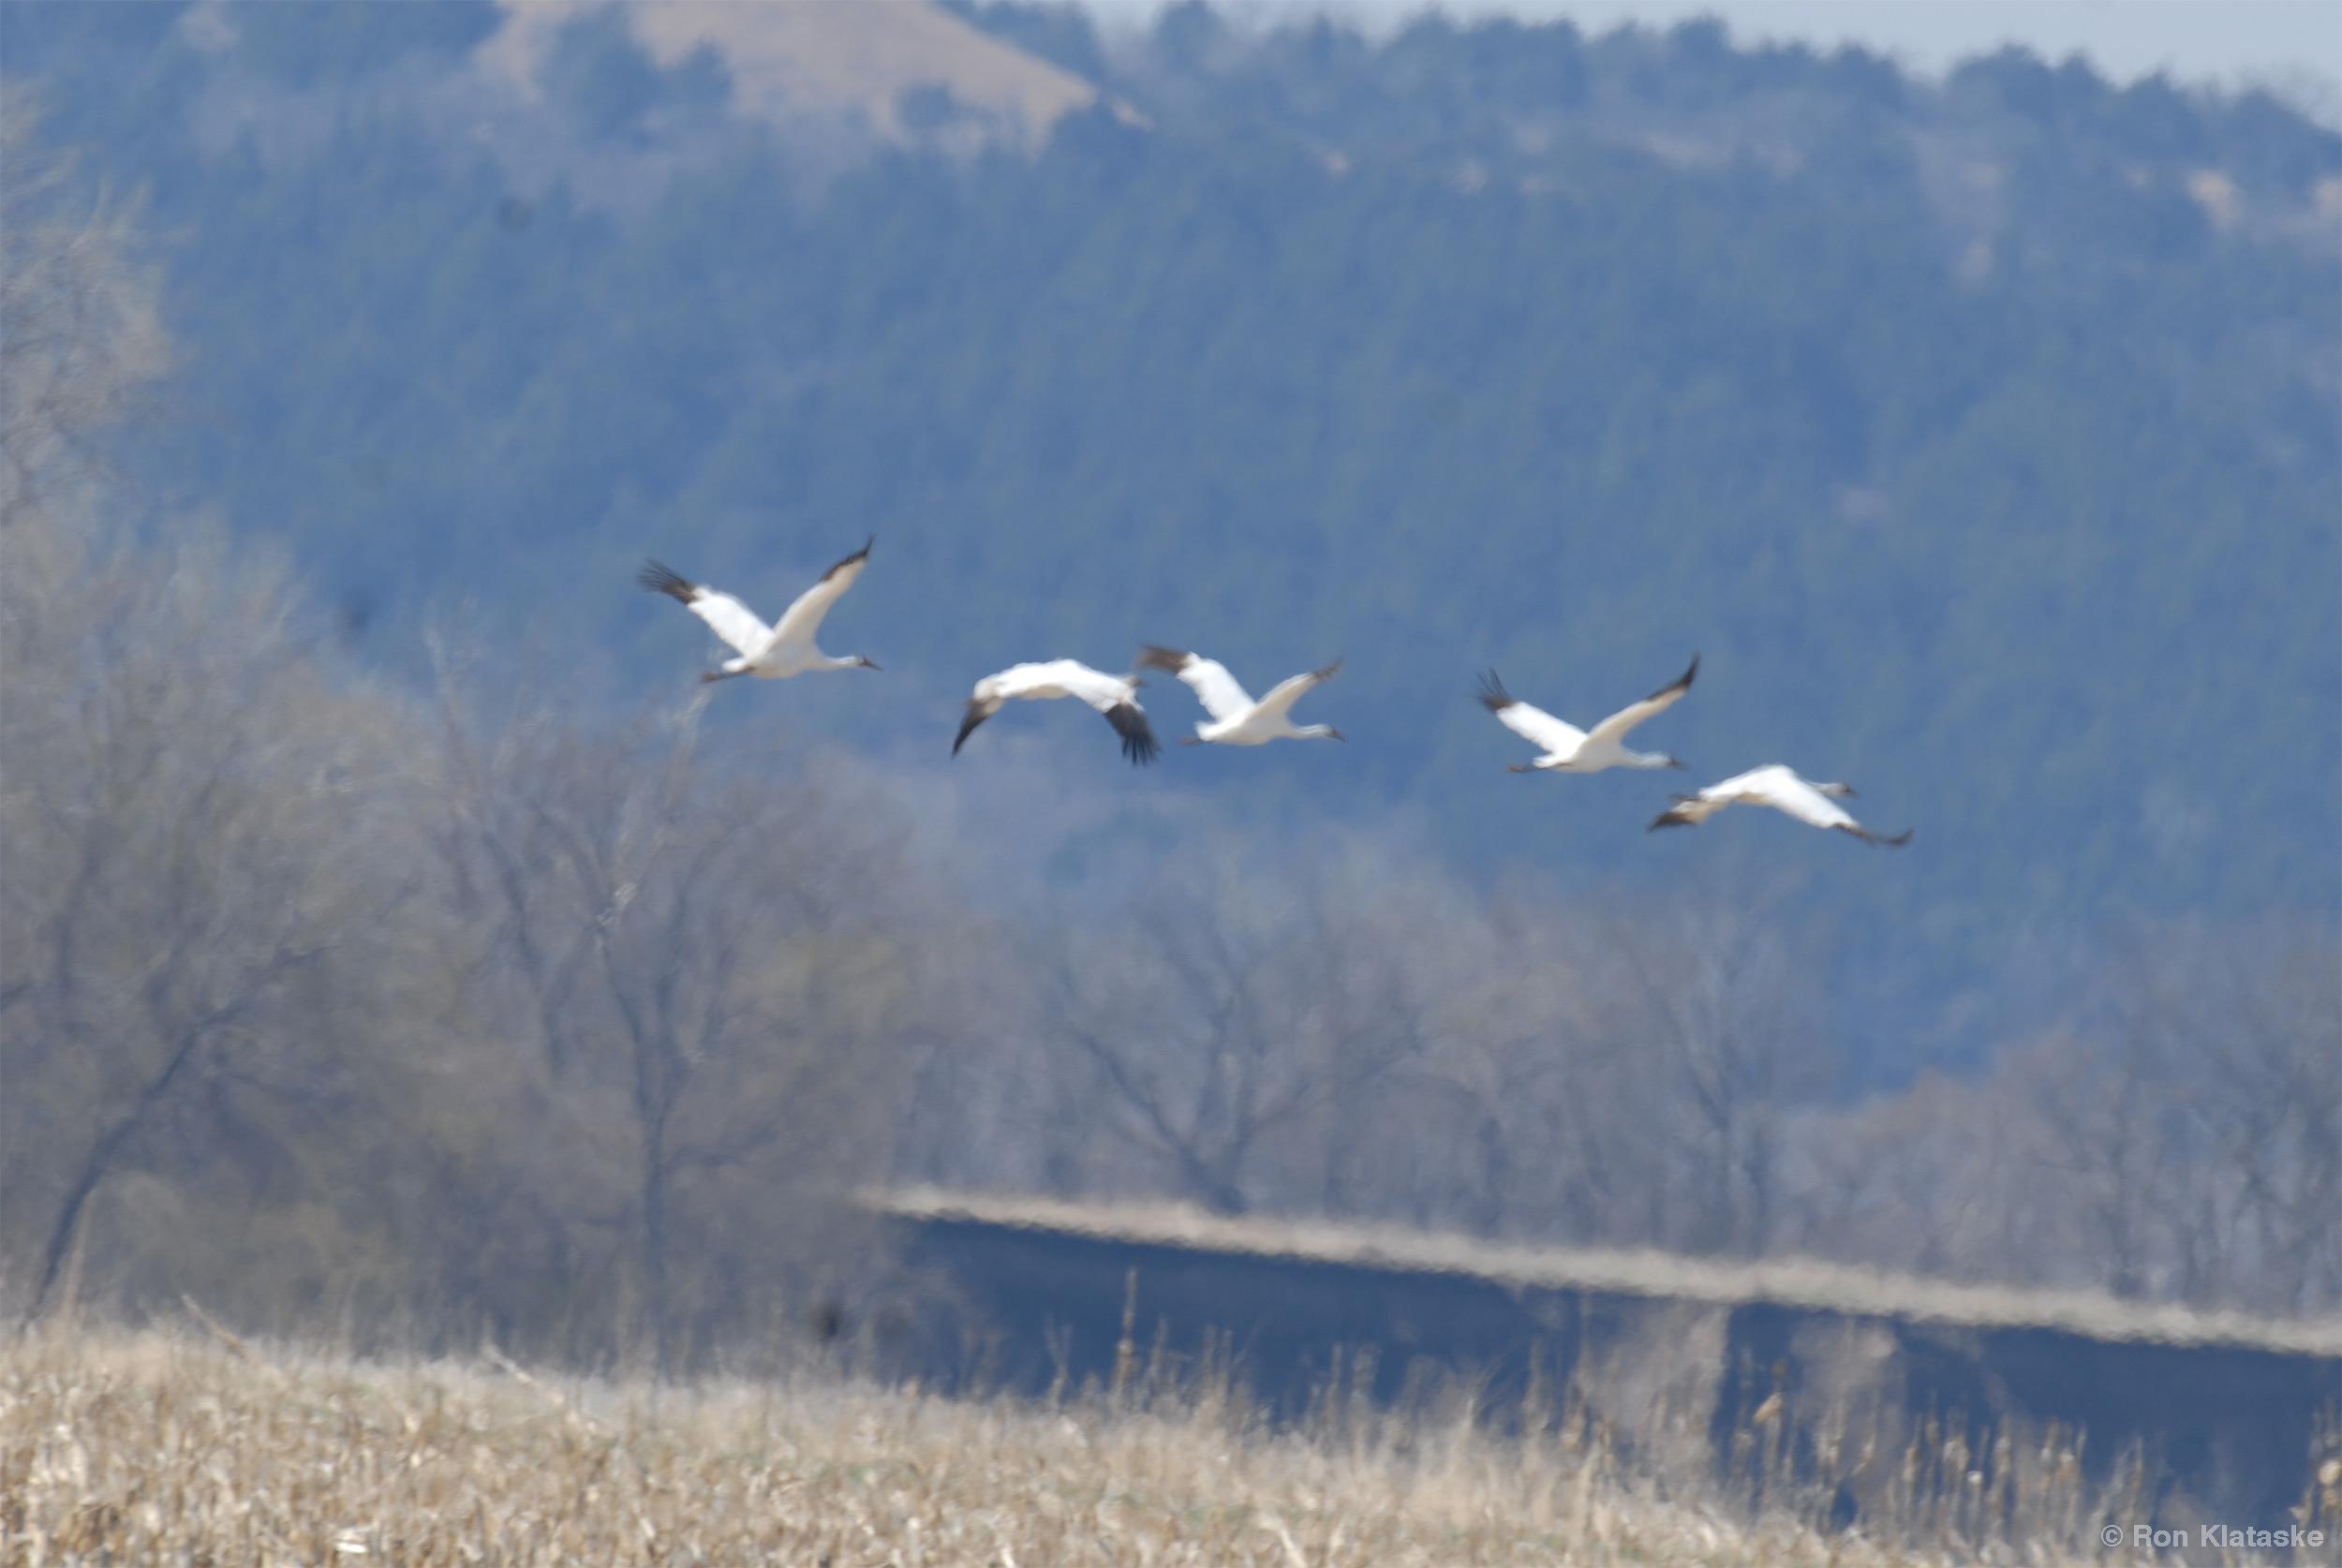 Whooping Cranes near Kaw River by Ron Klataske